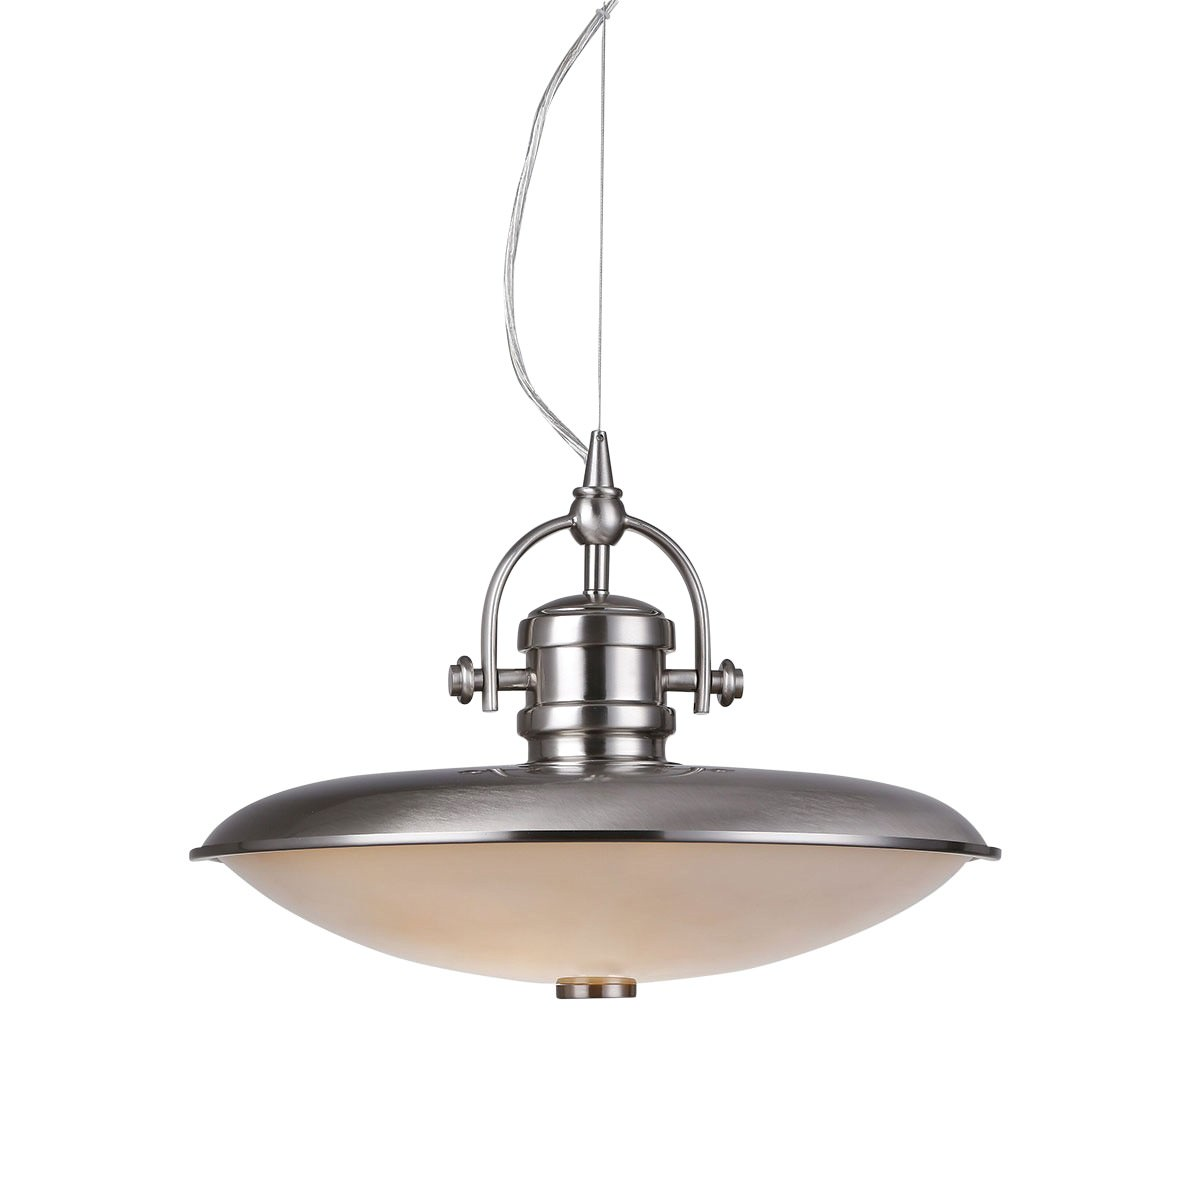 Mainz Metal & Glass Pendant Light, Nickel